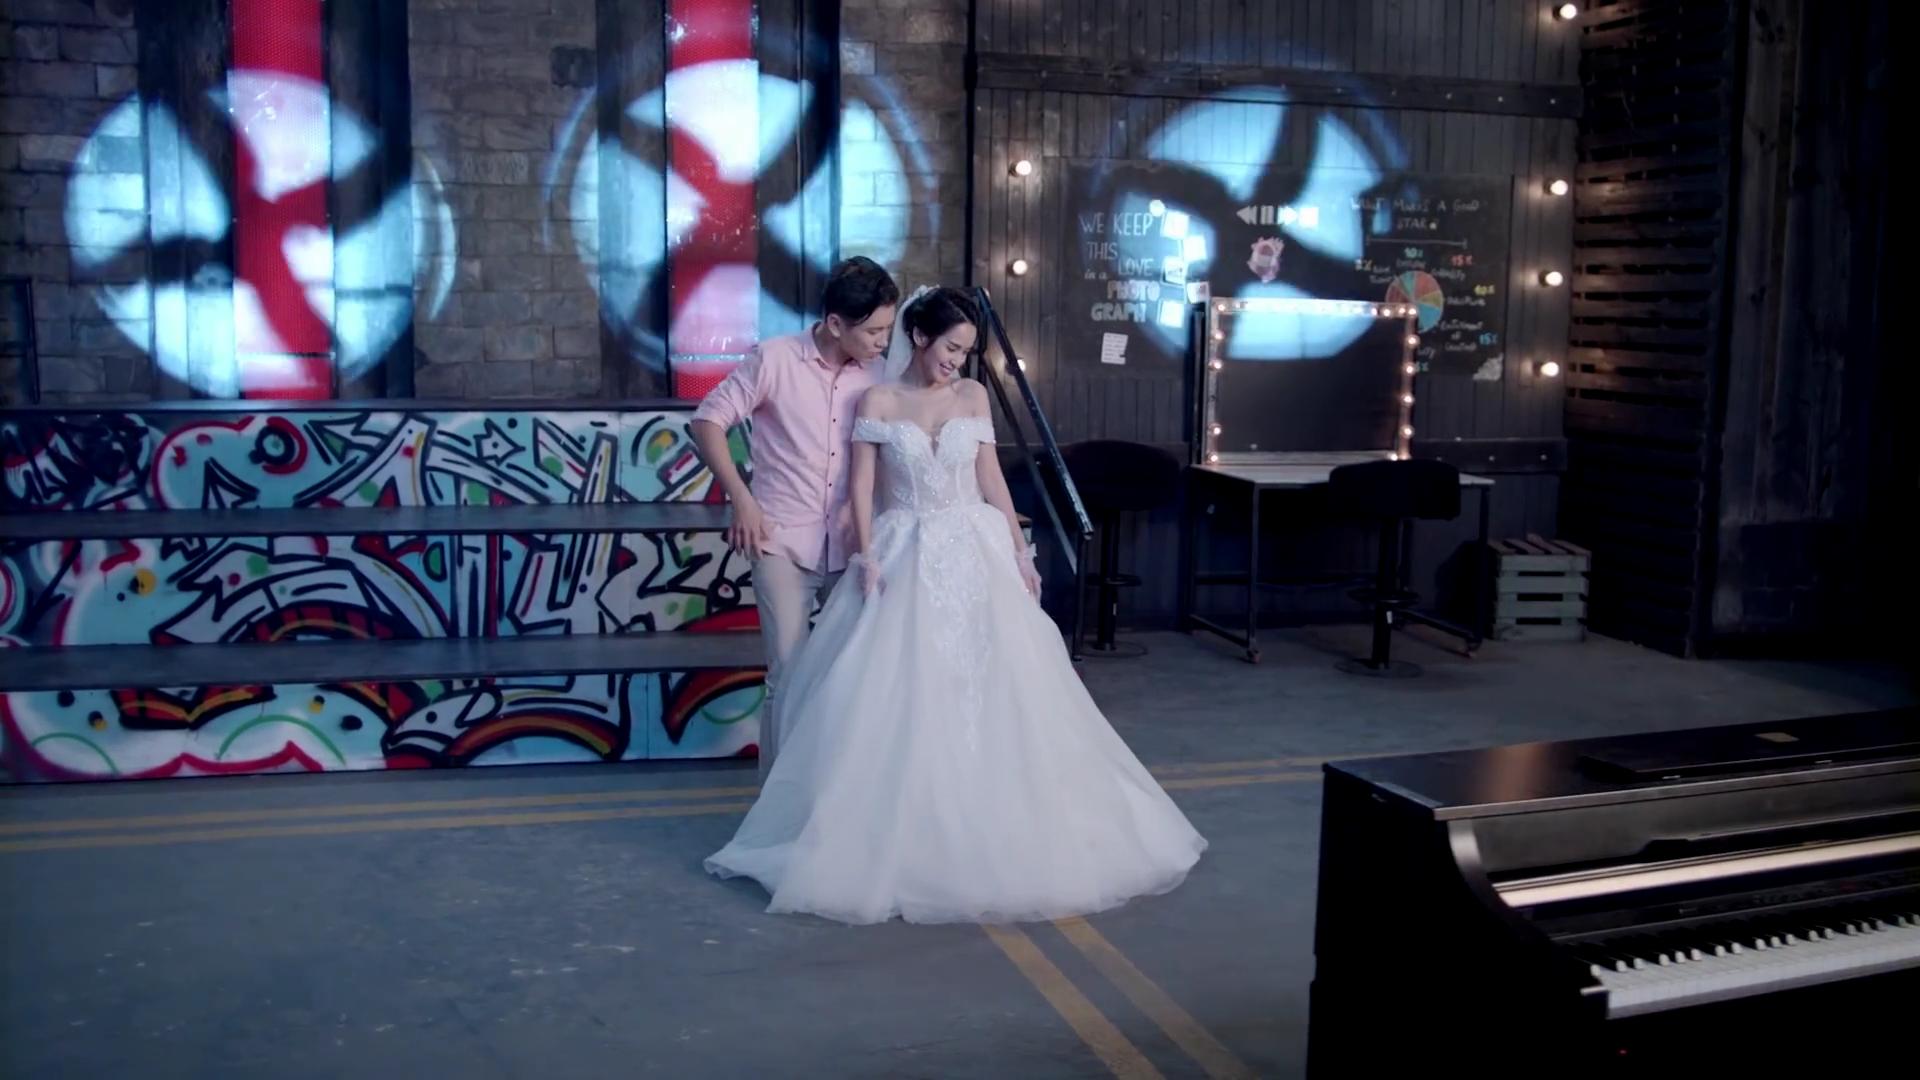 Say Ah (Glee Vietnam OST - Tập 8) - The Glee Cast Vietnam